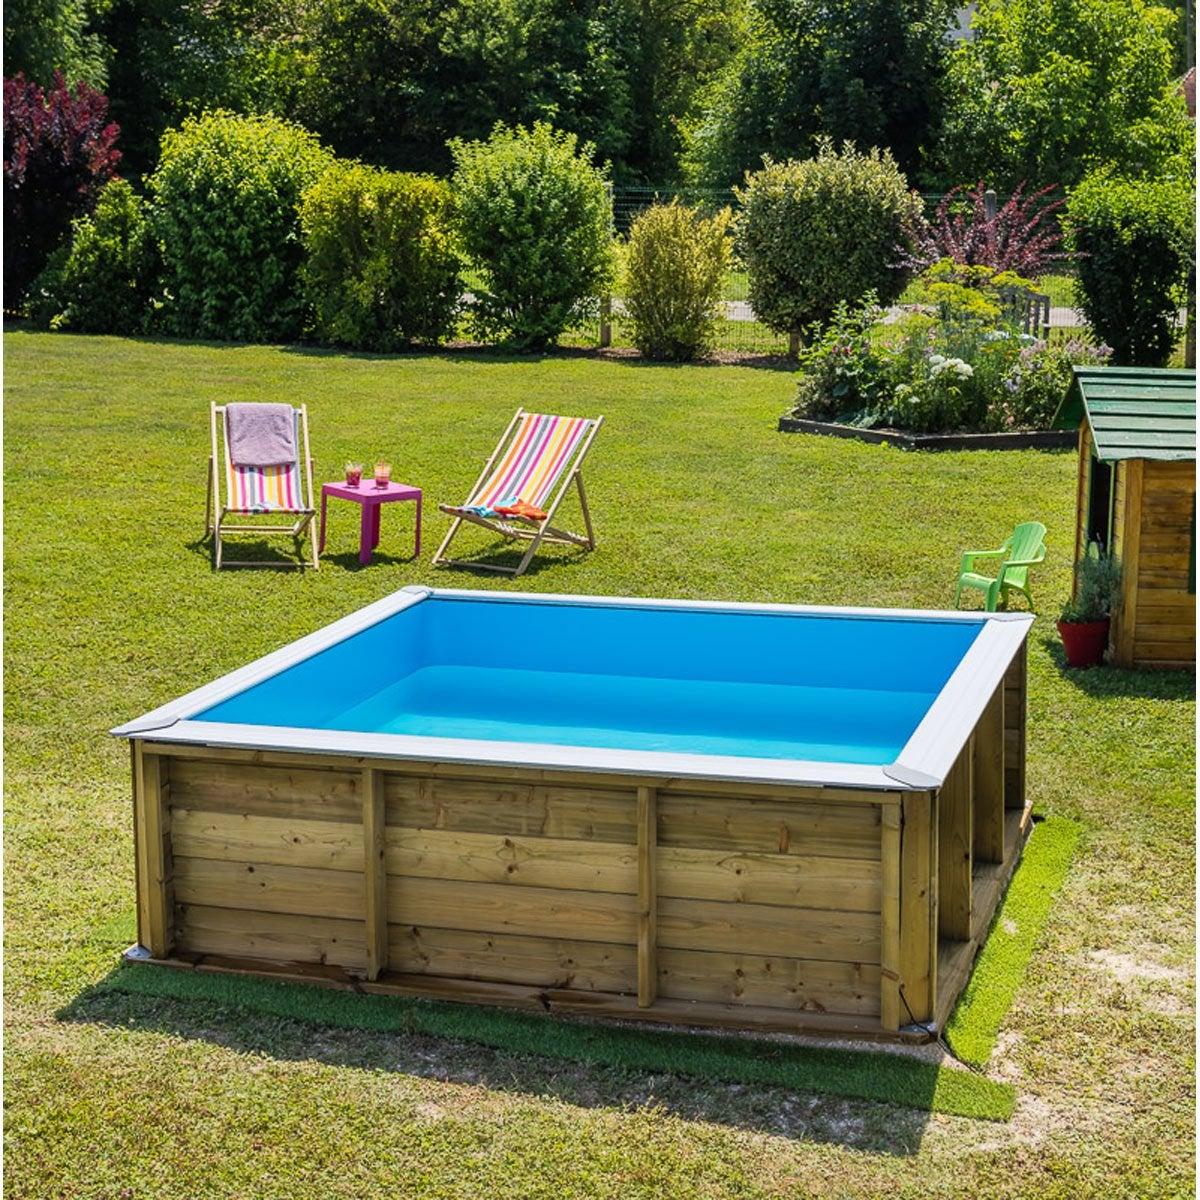 piscinette pistoche leroy merlin. Black Bedroom Furniture Sets. Home Design Ideas